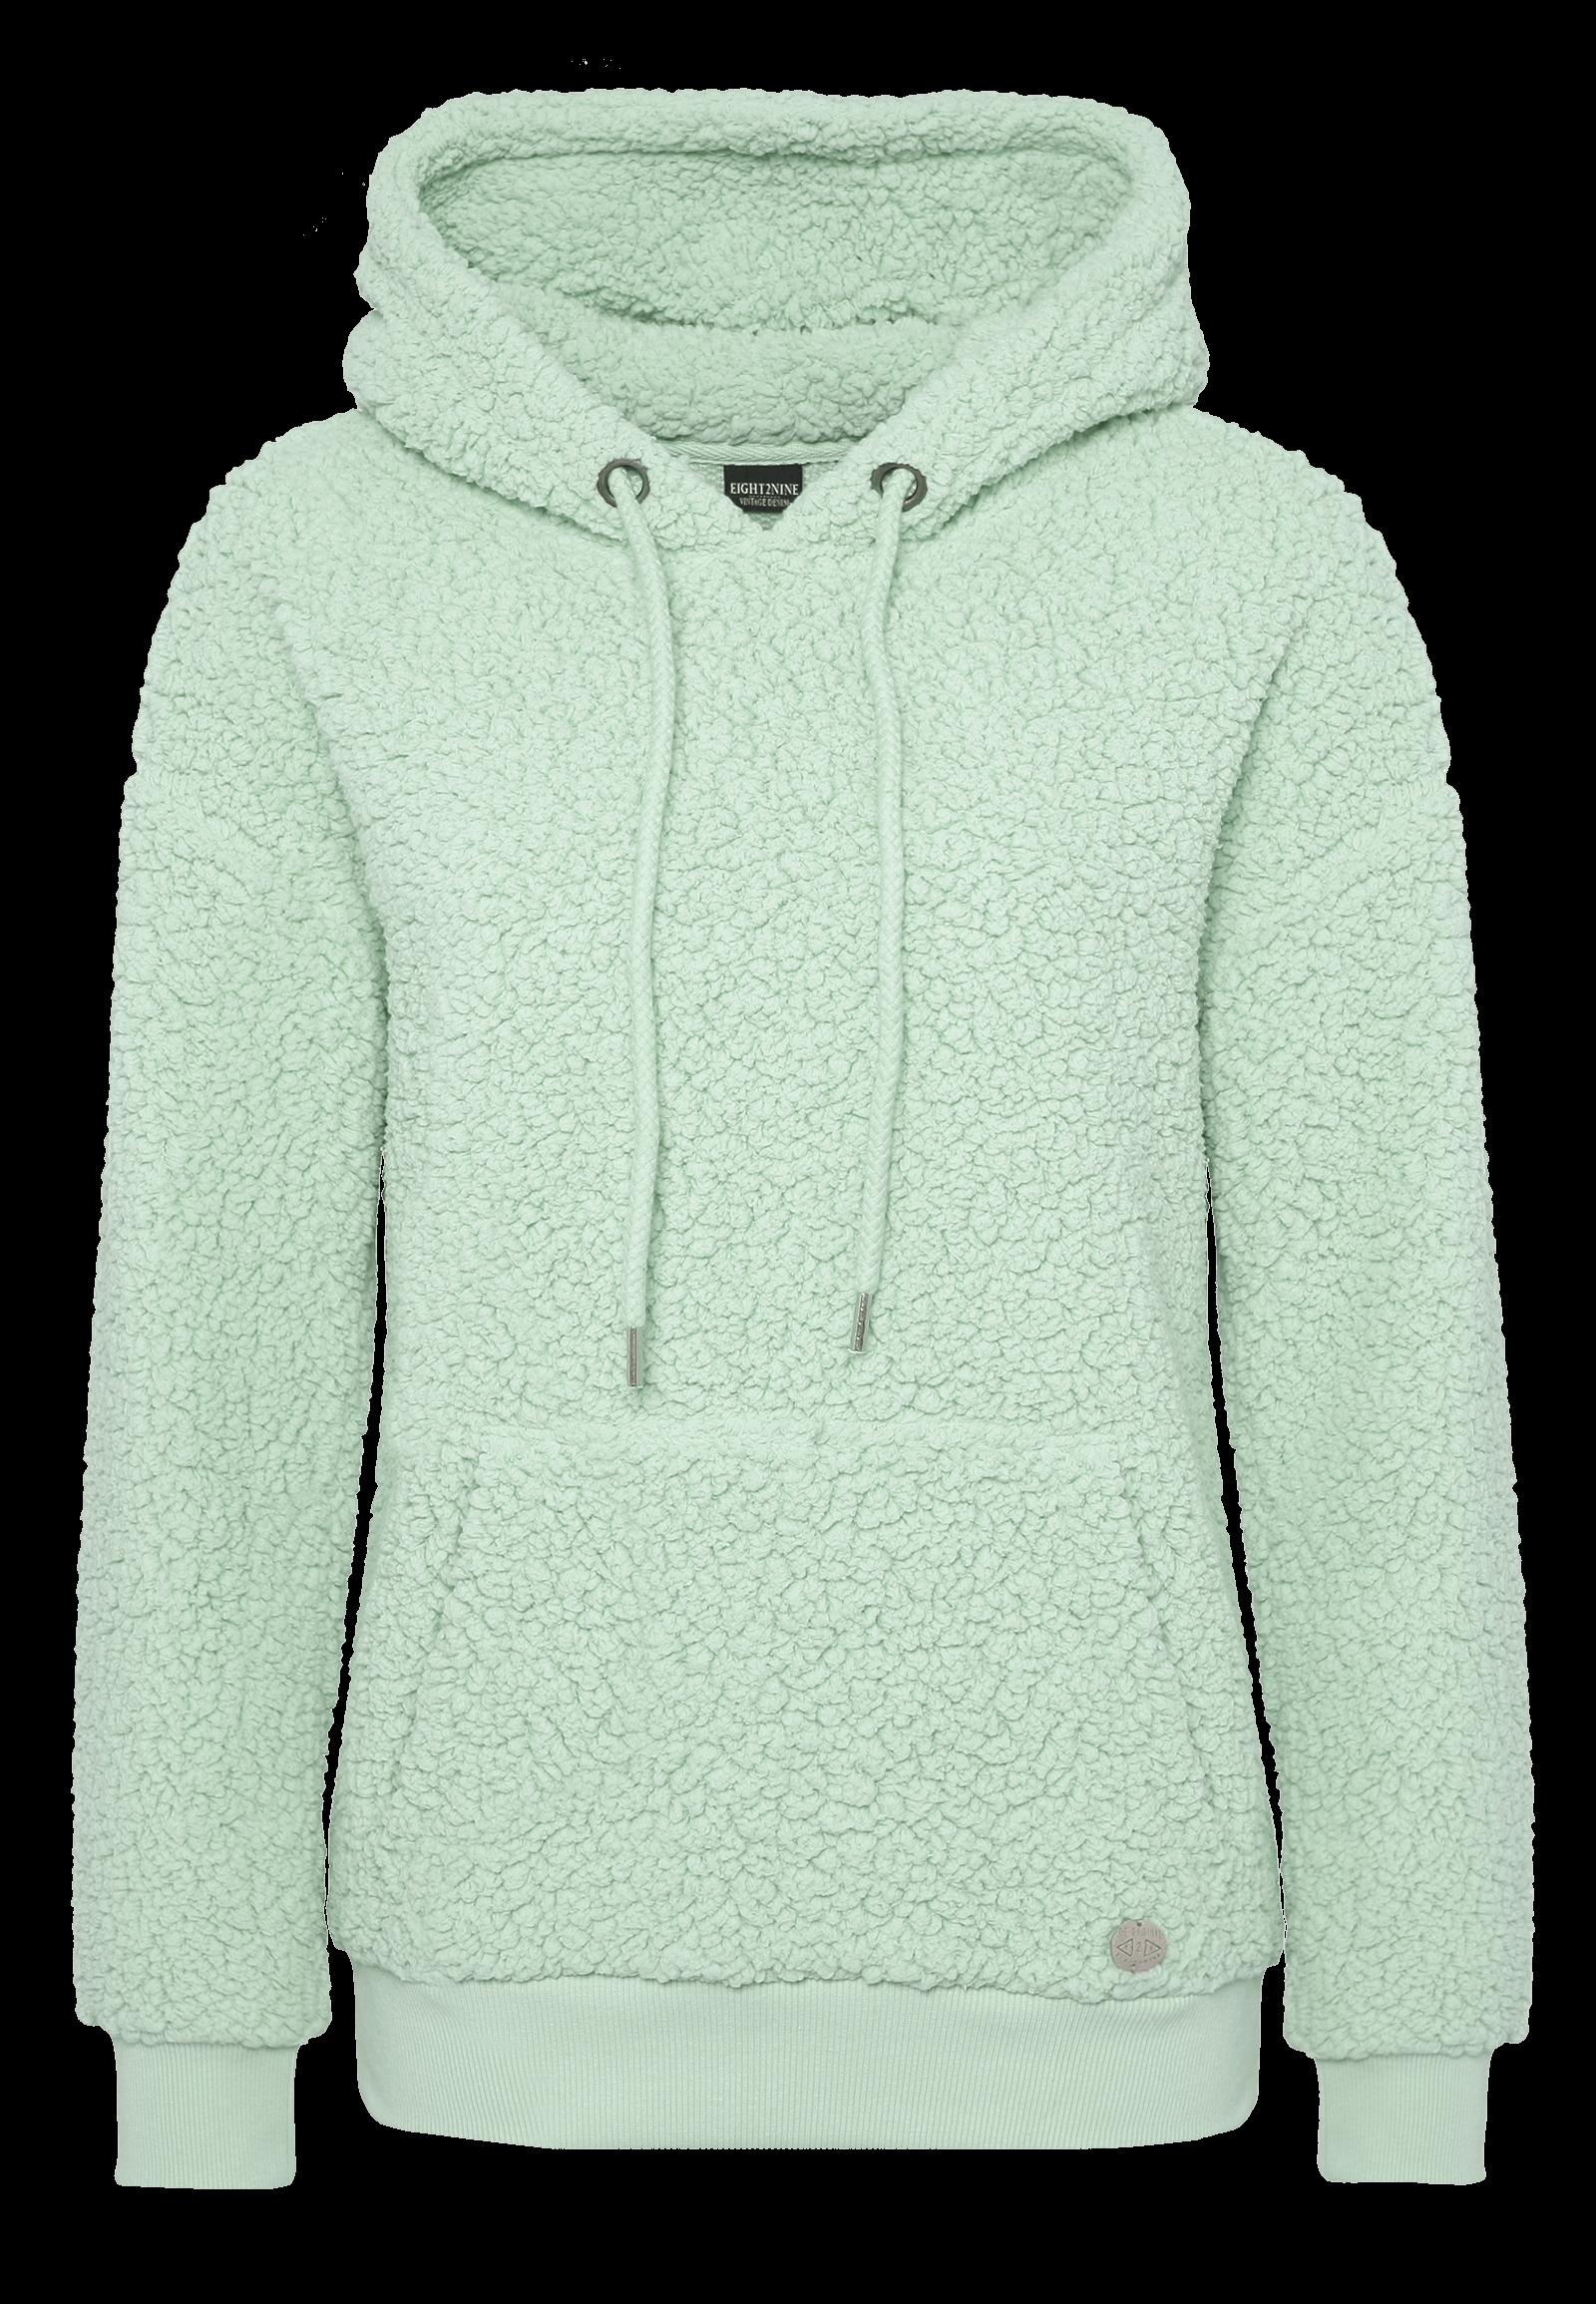 Teddyfleece Hoodie green